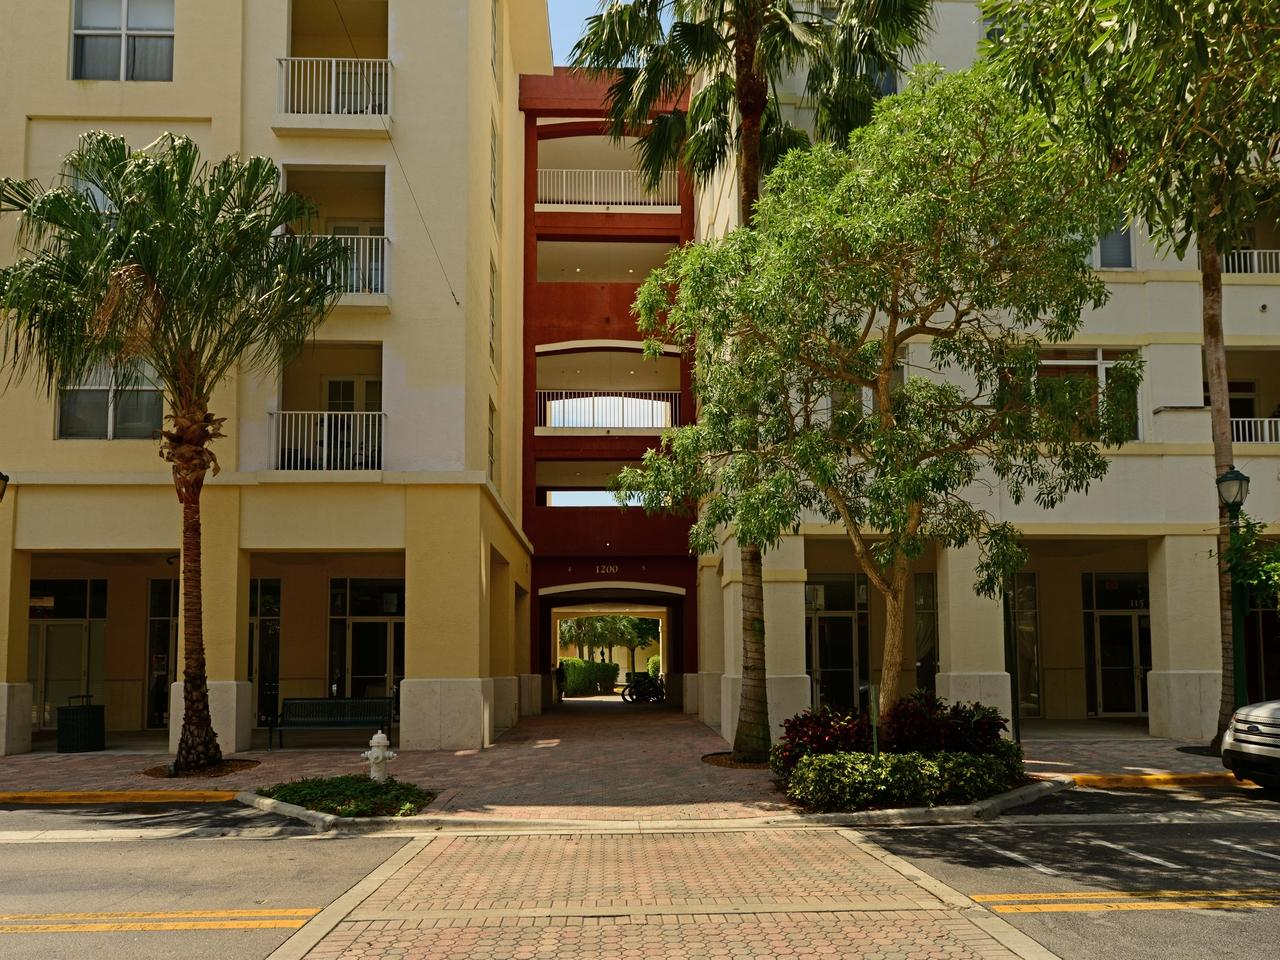 1200 Town Center Drive 216, Jupiter, Florida 33458, 2 Bedrooms Bedrooms, ,2 BathroomsBathrooms,F,Condominium,Town Center,RX-10649829